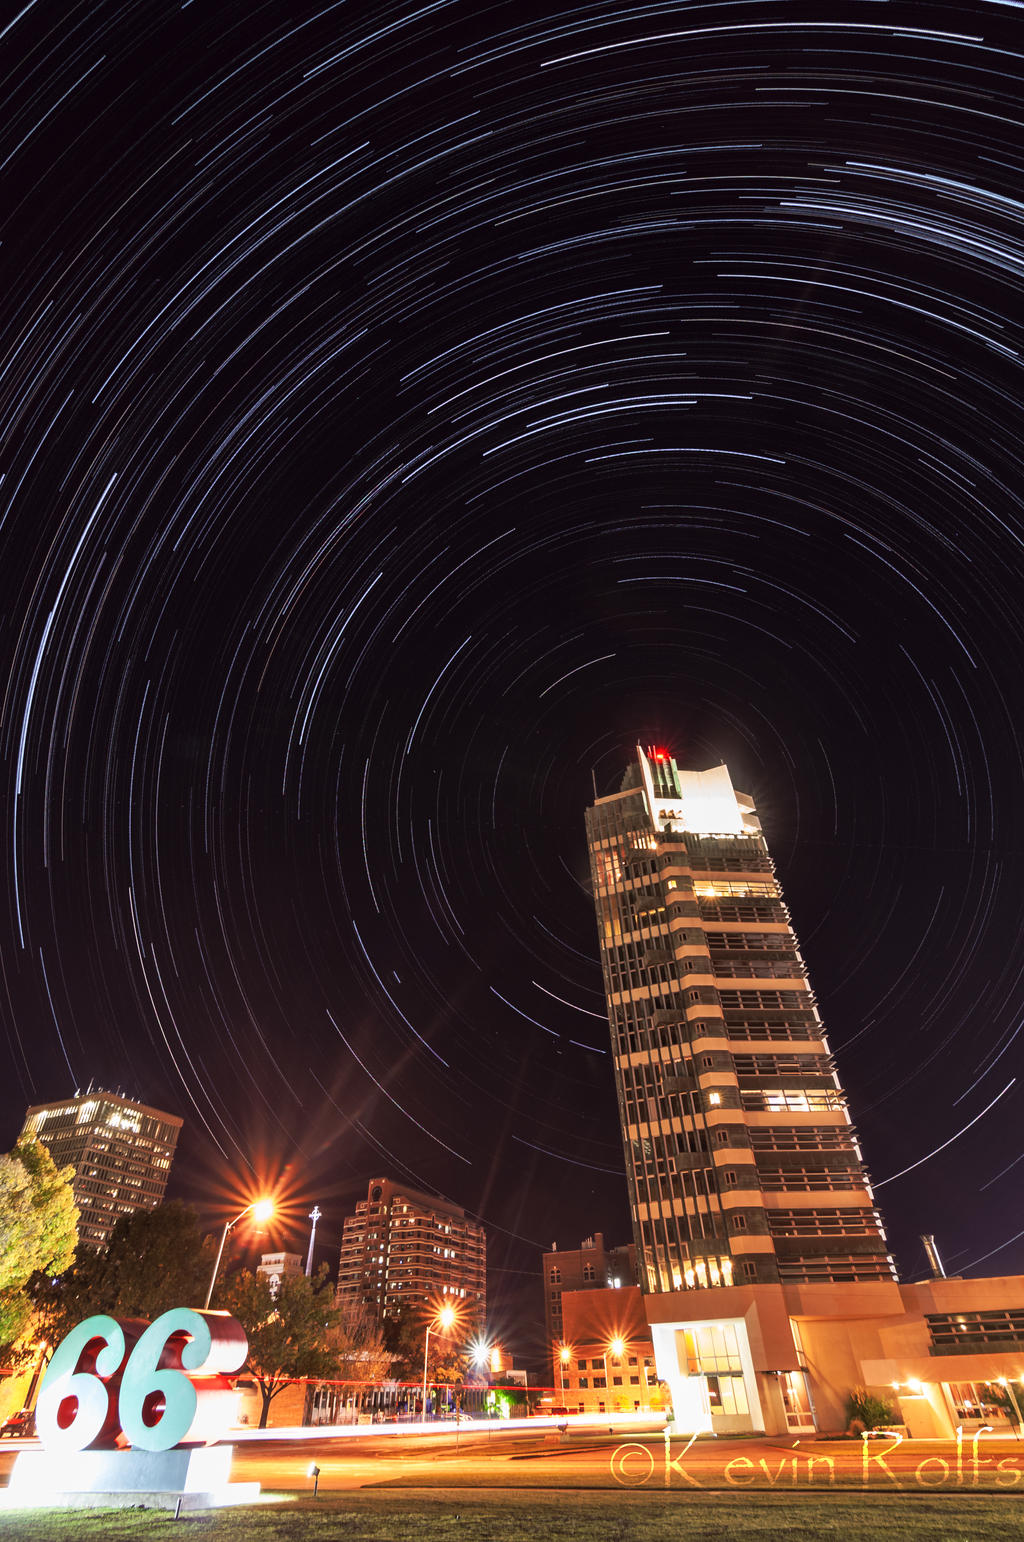 Price Tower Star Trail by Bvilleweatherman